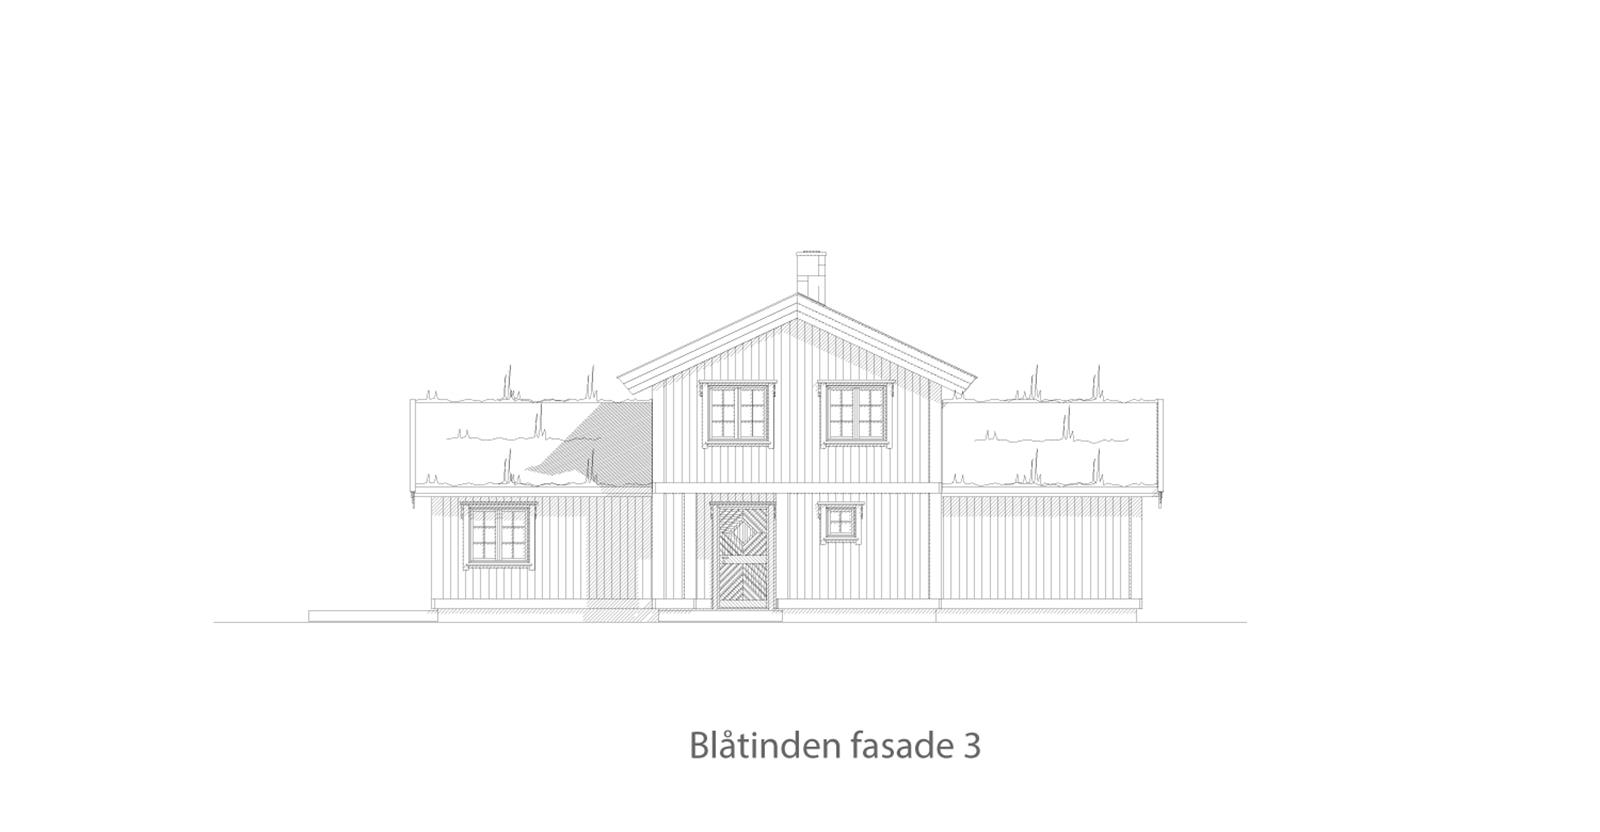 Blåtinden fasade 3